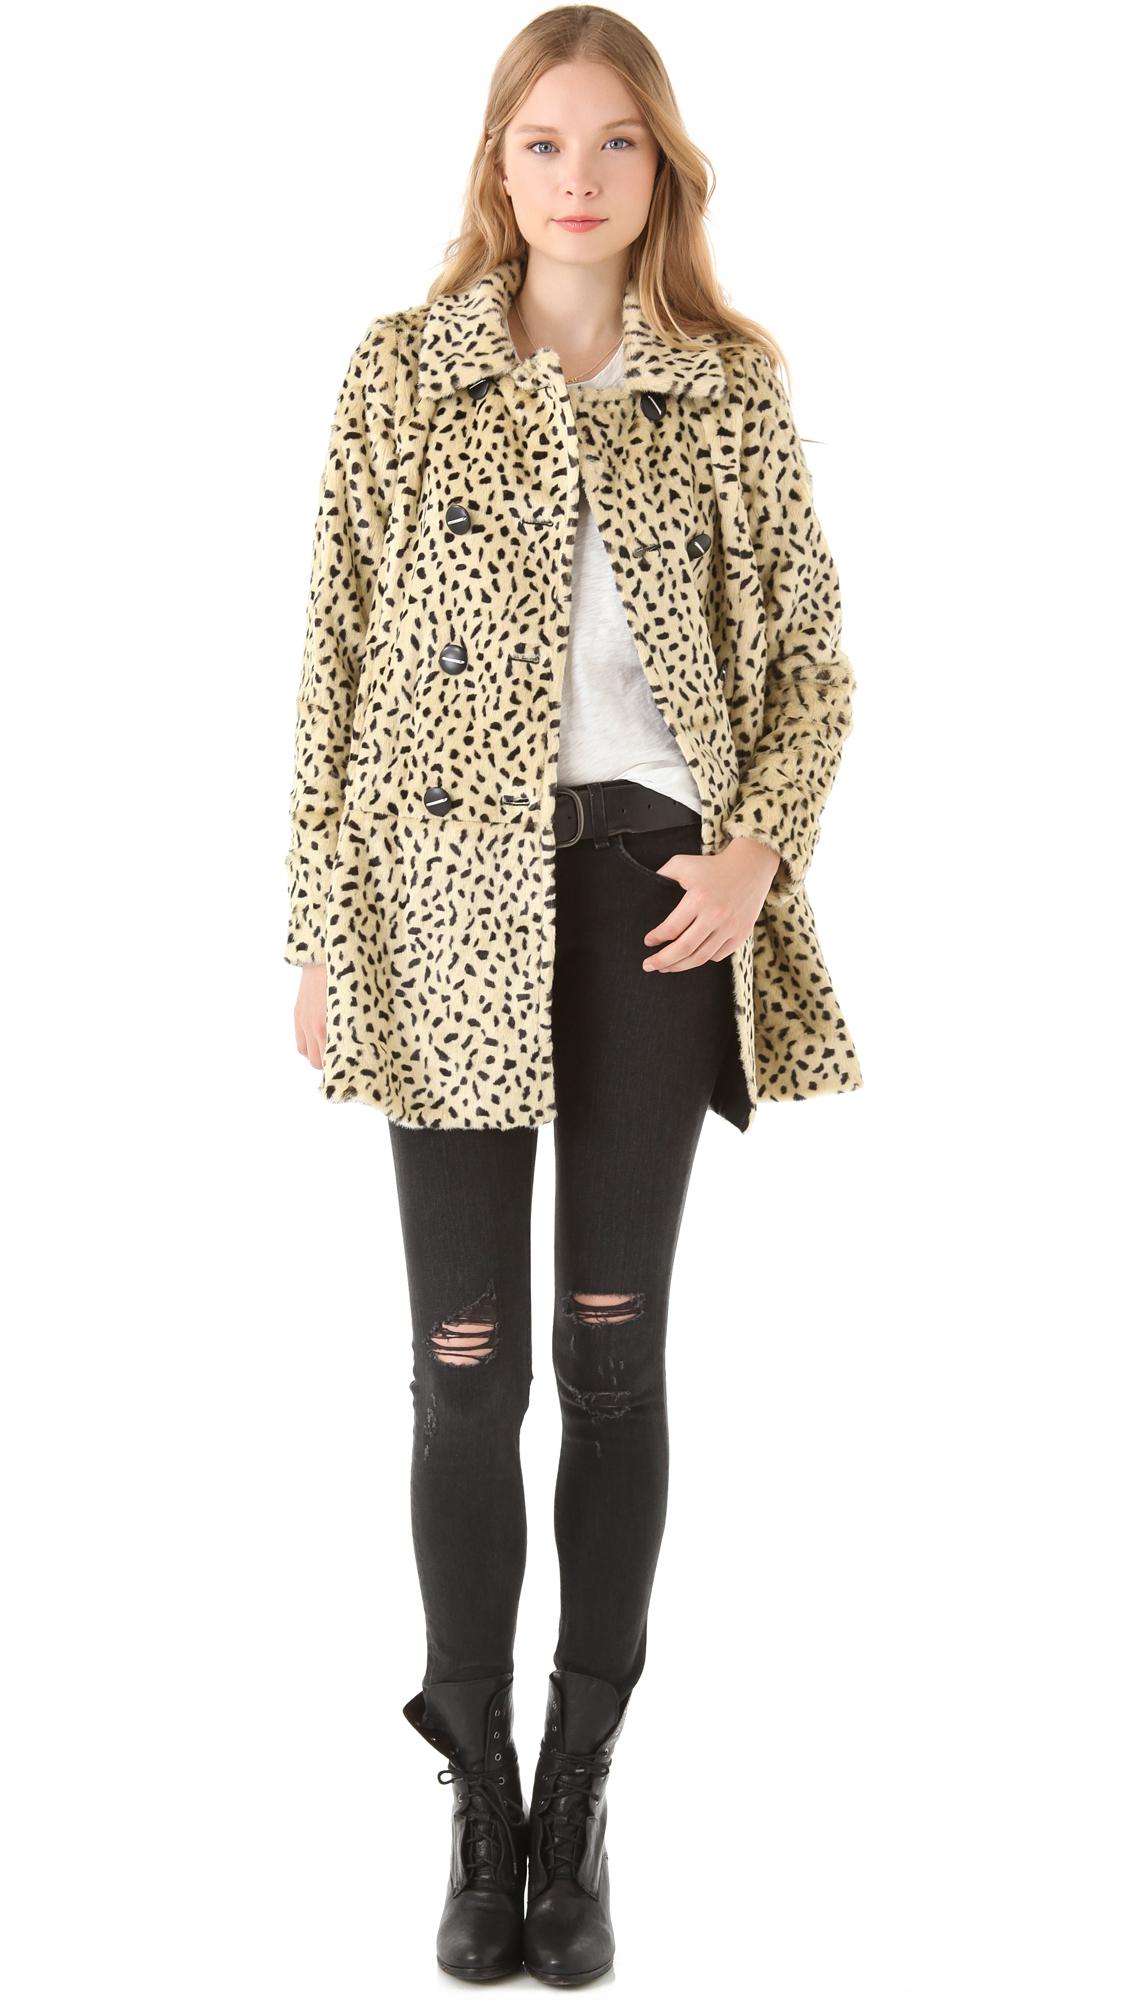 0d7a22e23316 Free People Faux Fur Cheetah Coat | SHOPBOP